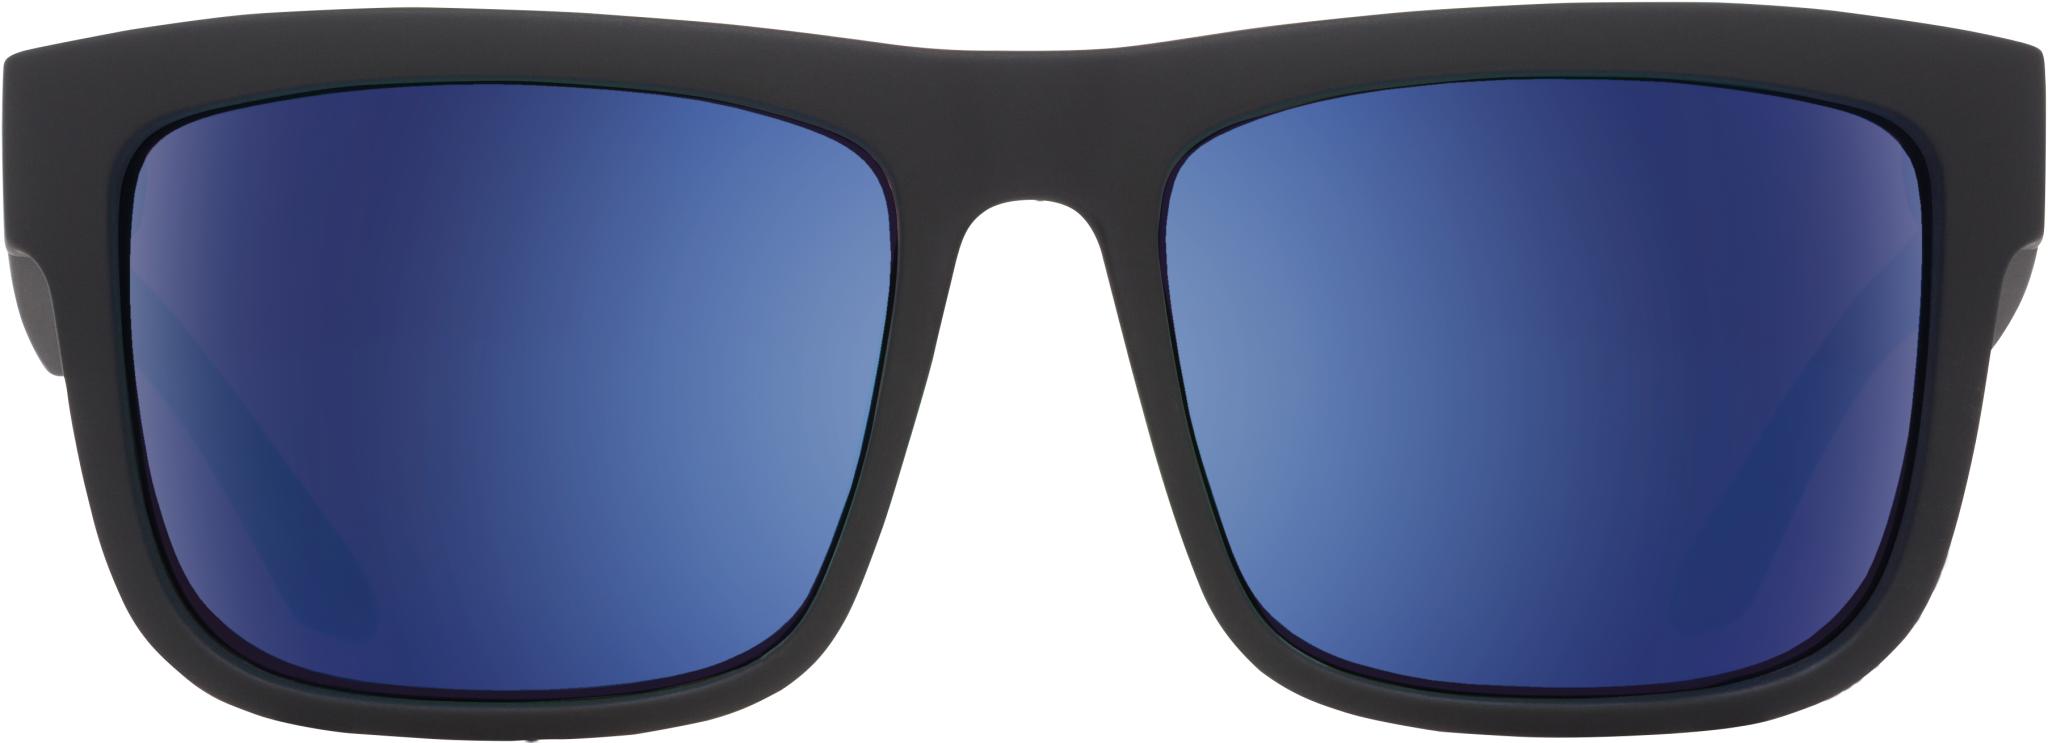 SPY Spy Discord Sunglasses